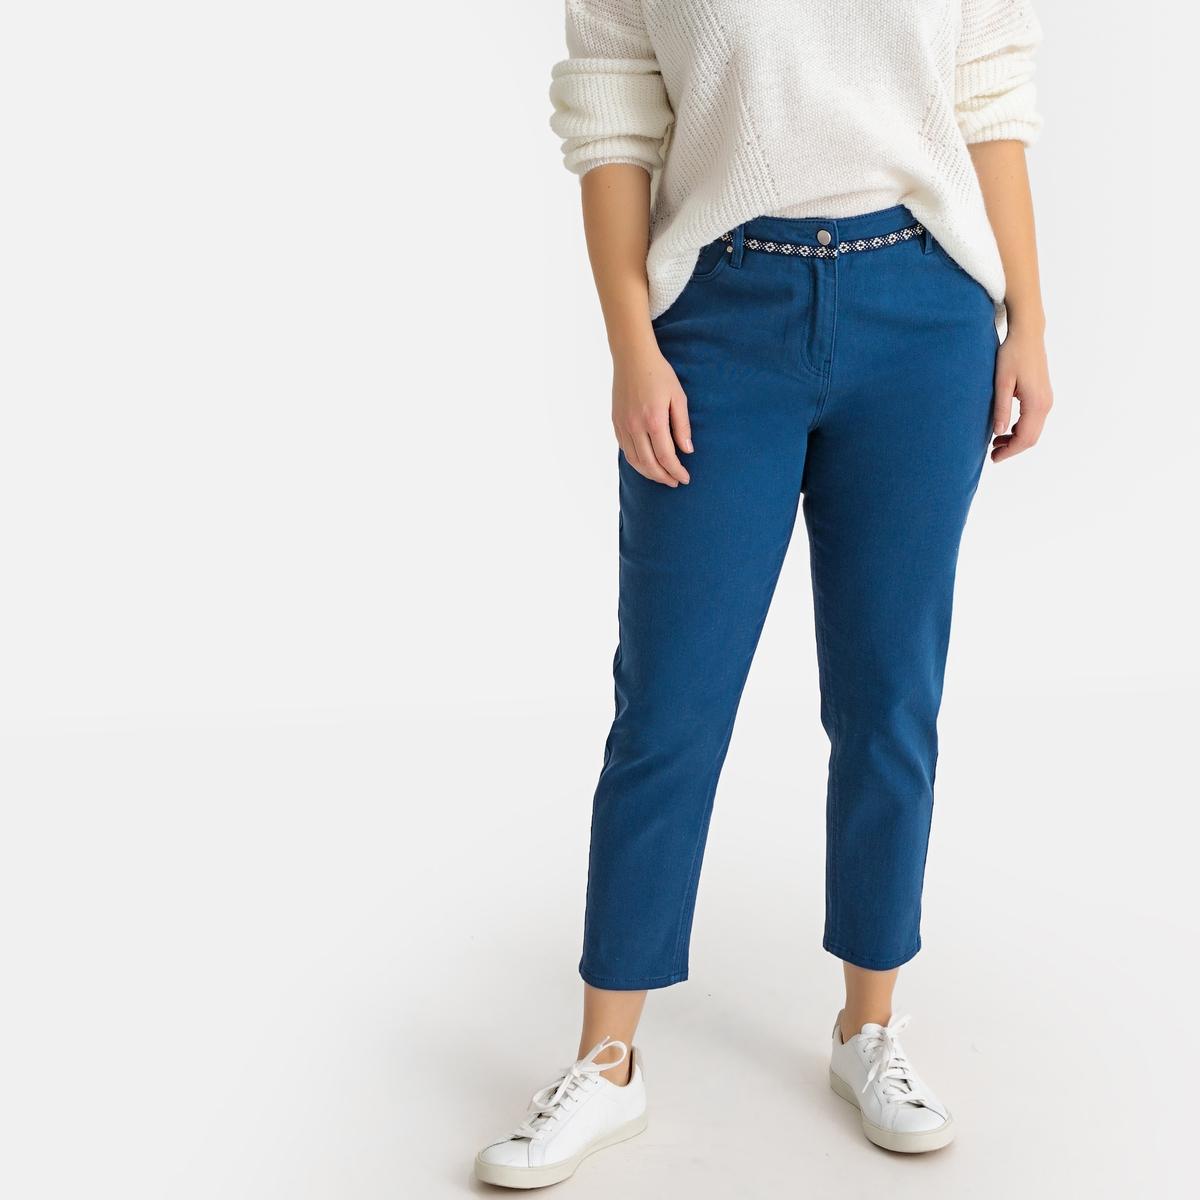 Jeans mom de cintura subida, cós fantasia